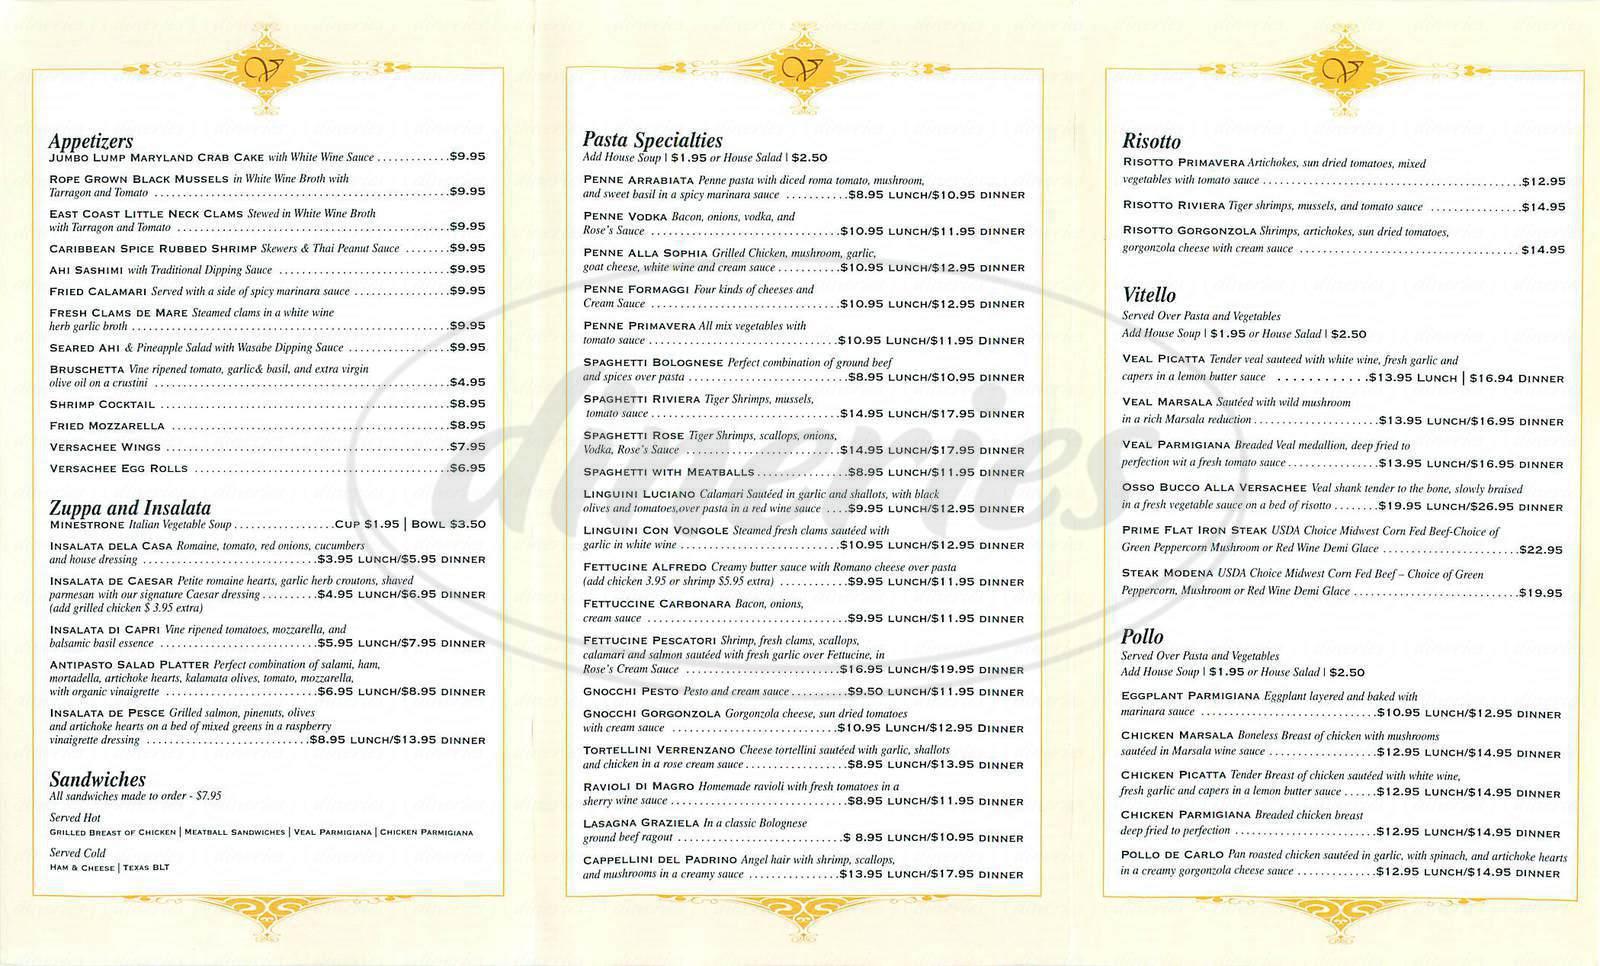 menu for Versachee